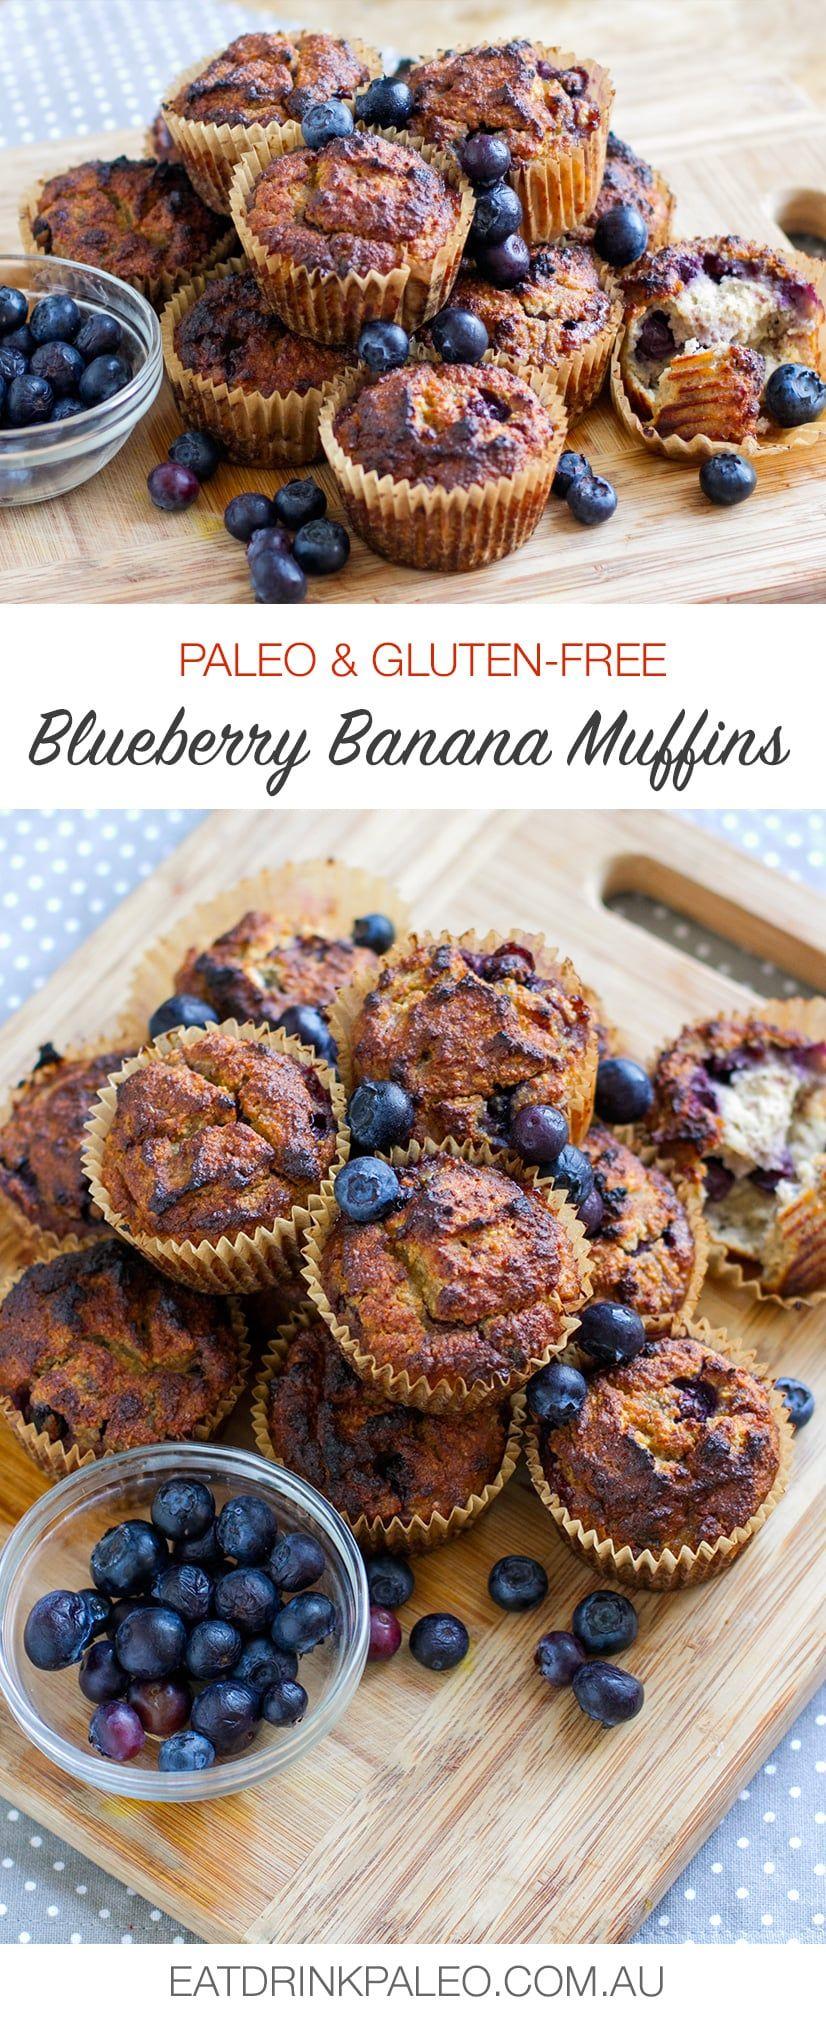 Paleo Blueberry Banana Muffins | http://eatdrinkpaleo.com.au/paleo-blueberry-banana-muffins/